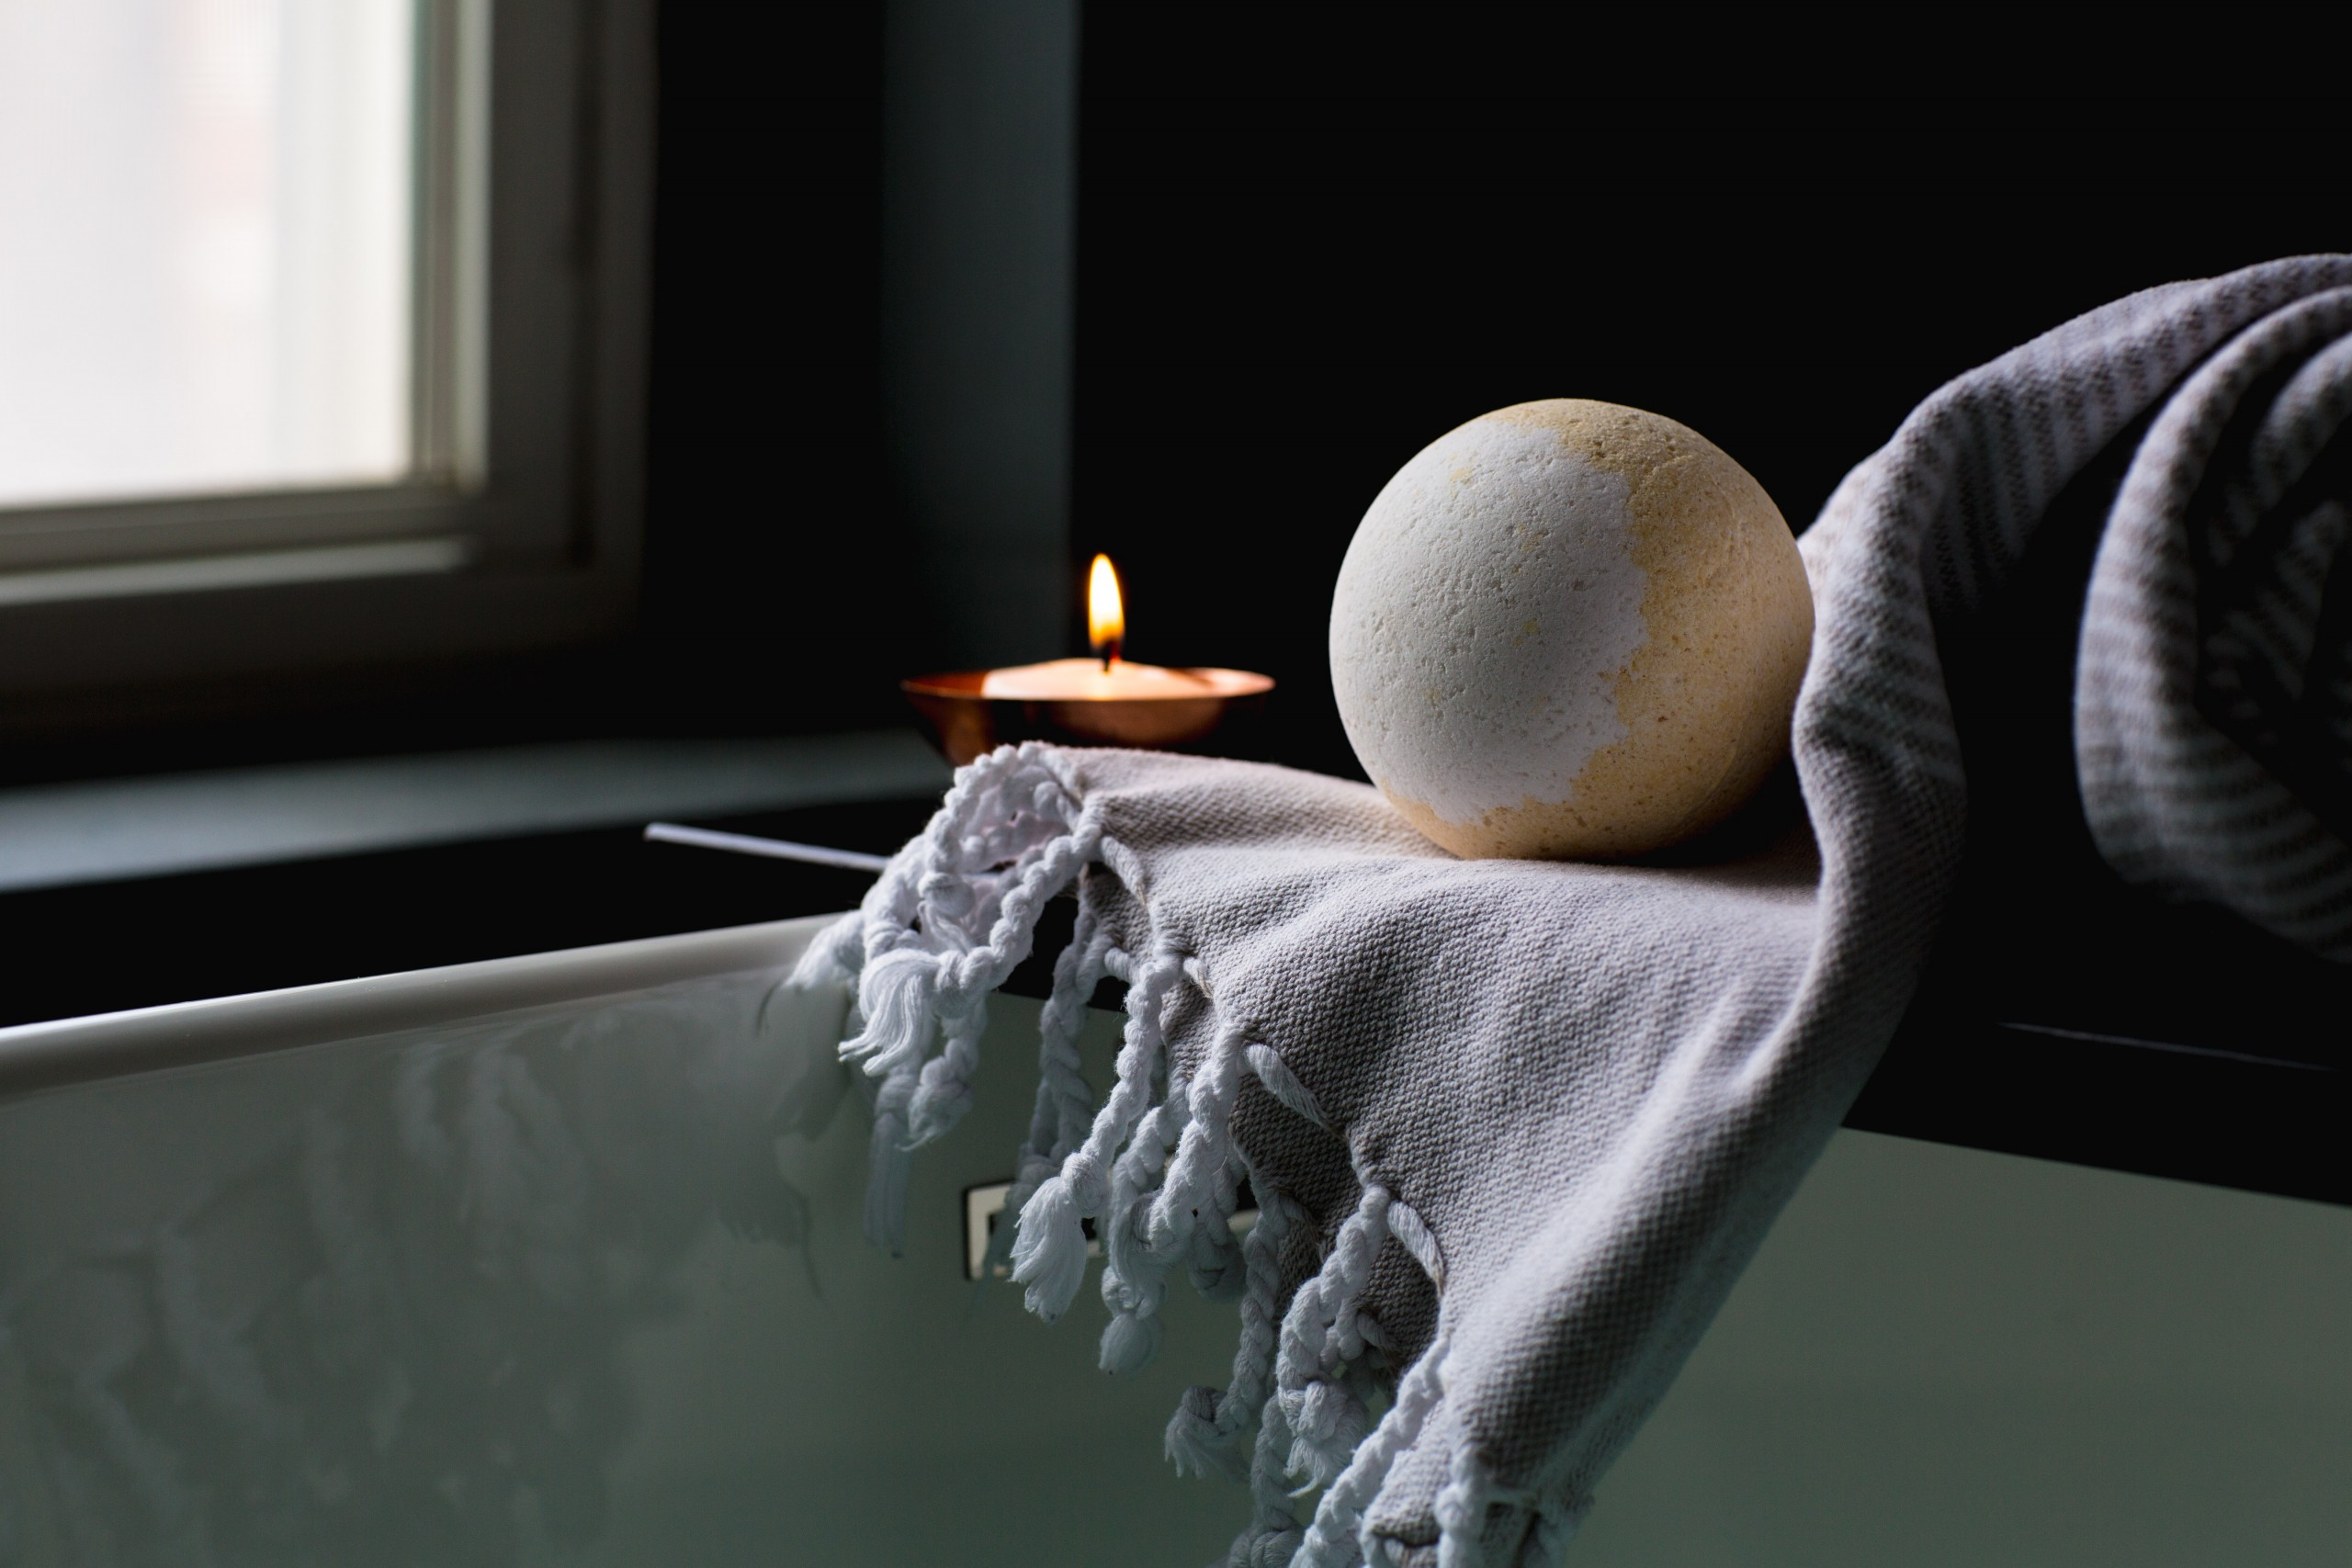 Bath Bomb, Candle, Tub.